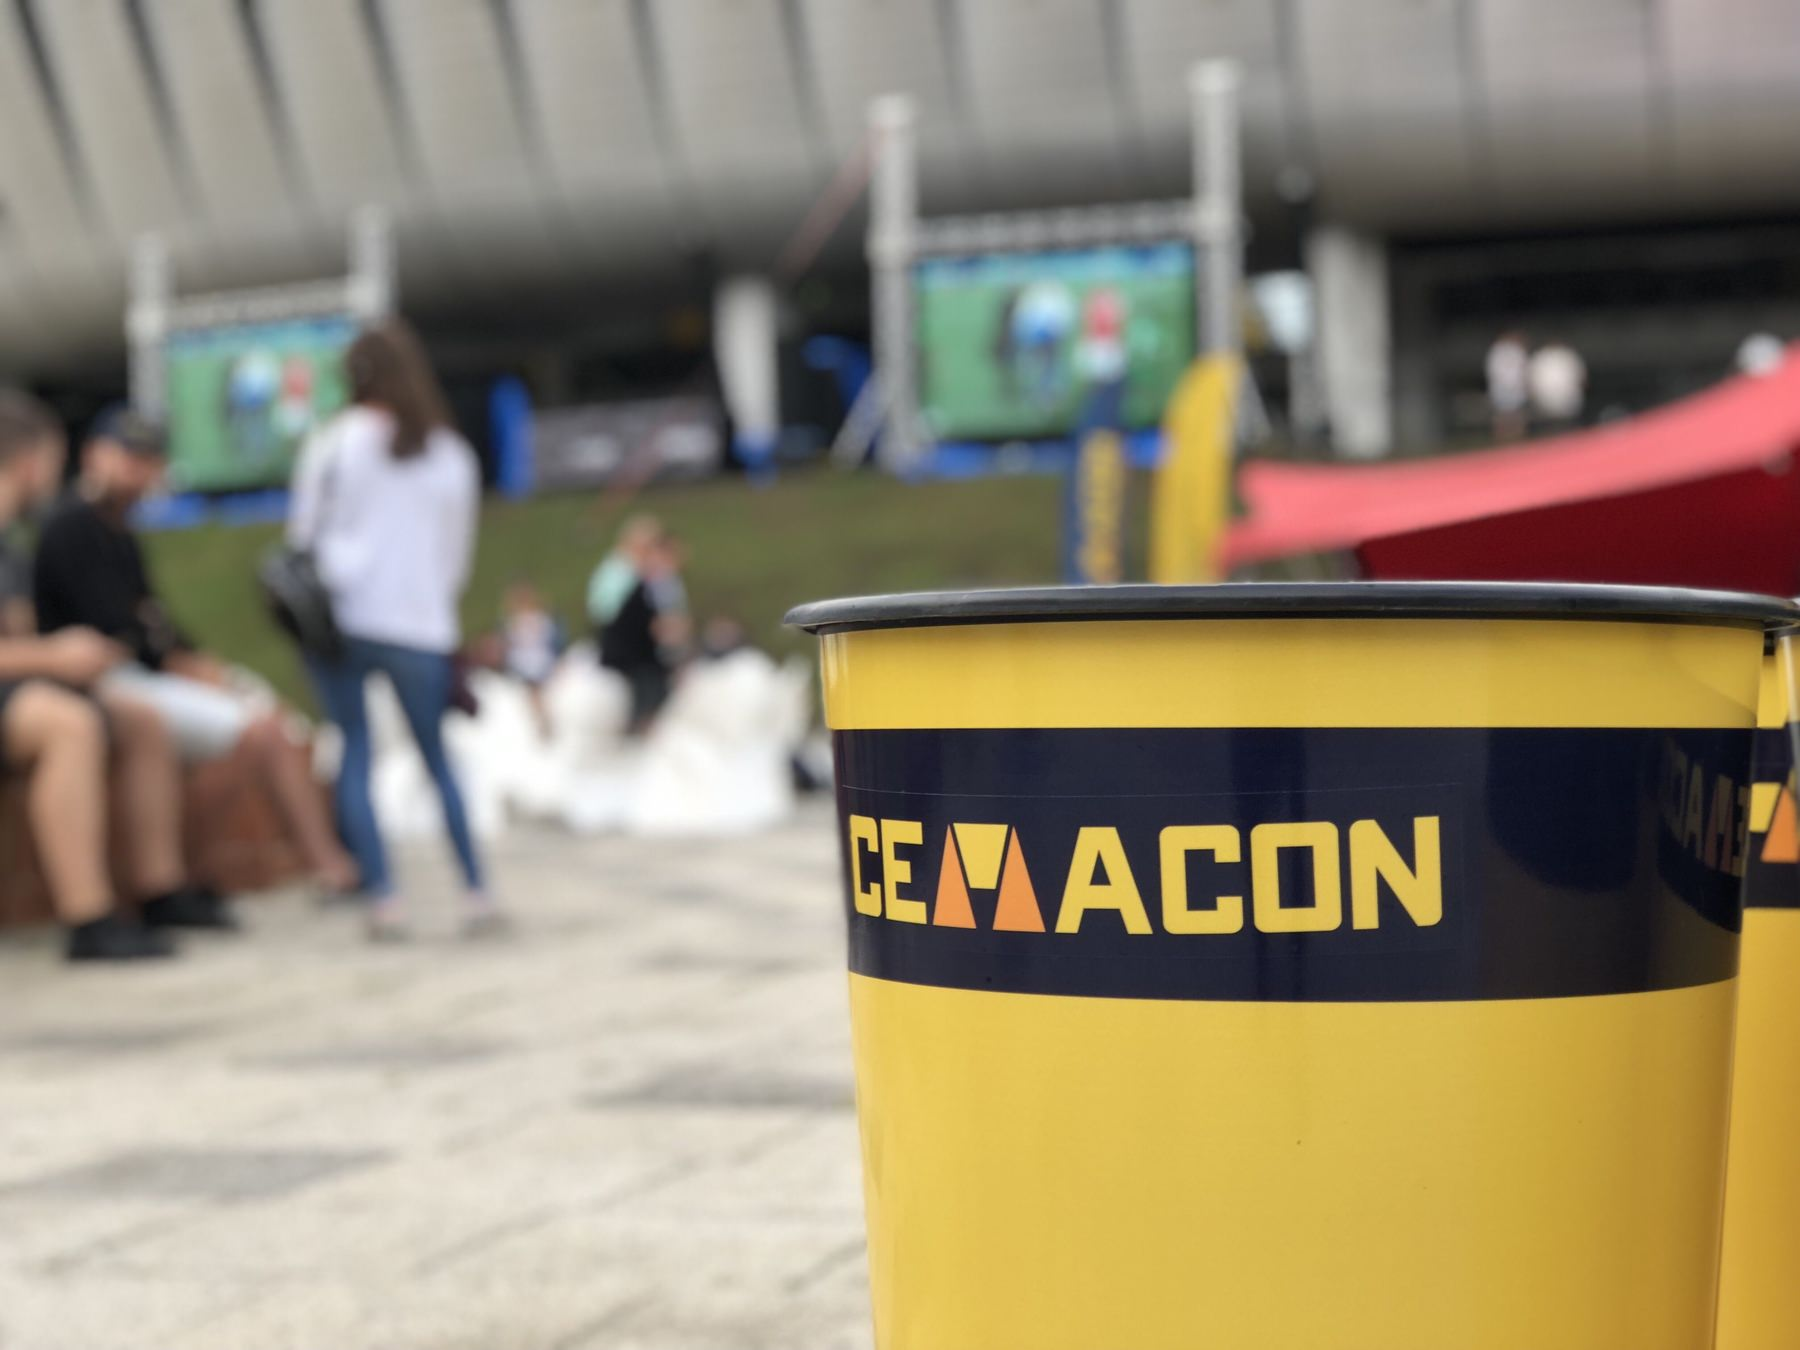 Activare-de-brand-cemacon-sports-festival